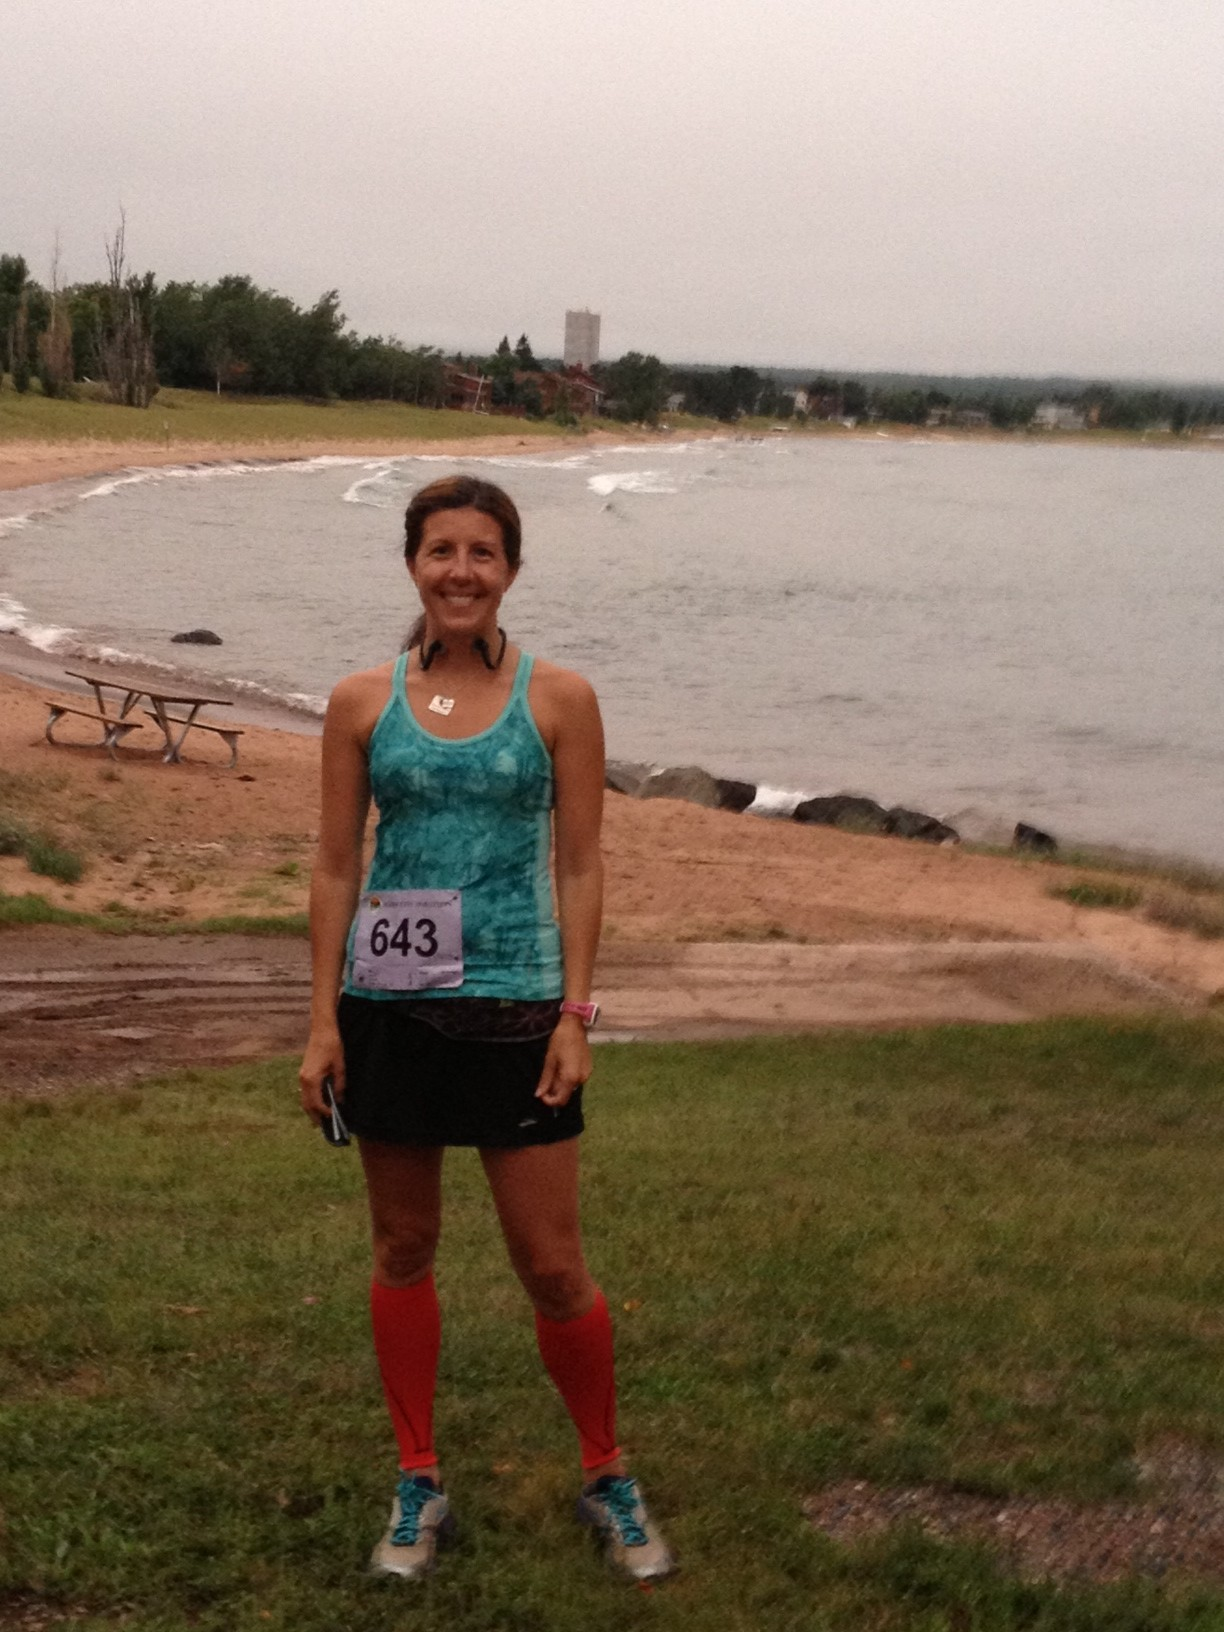 At the race start, along Lake Superior.